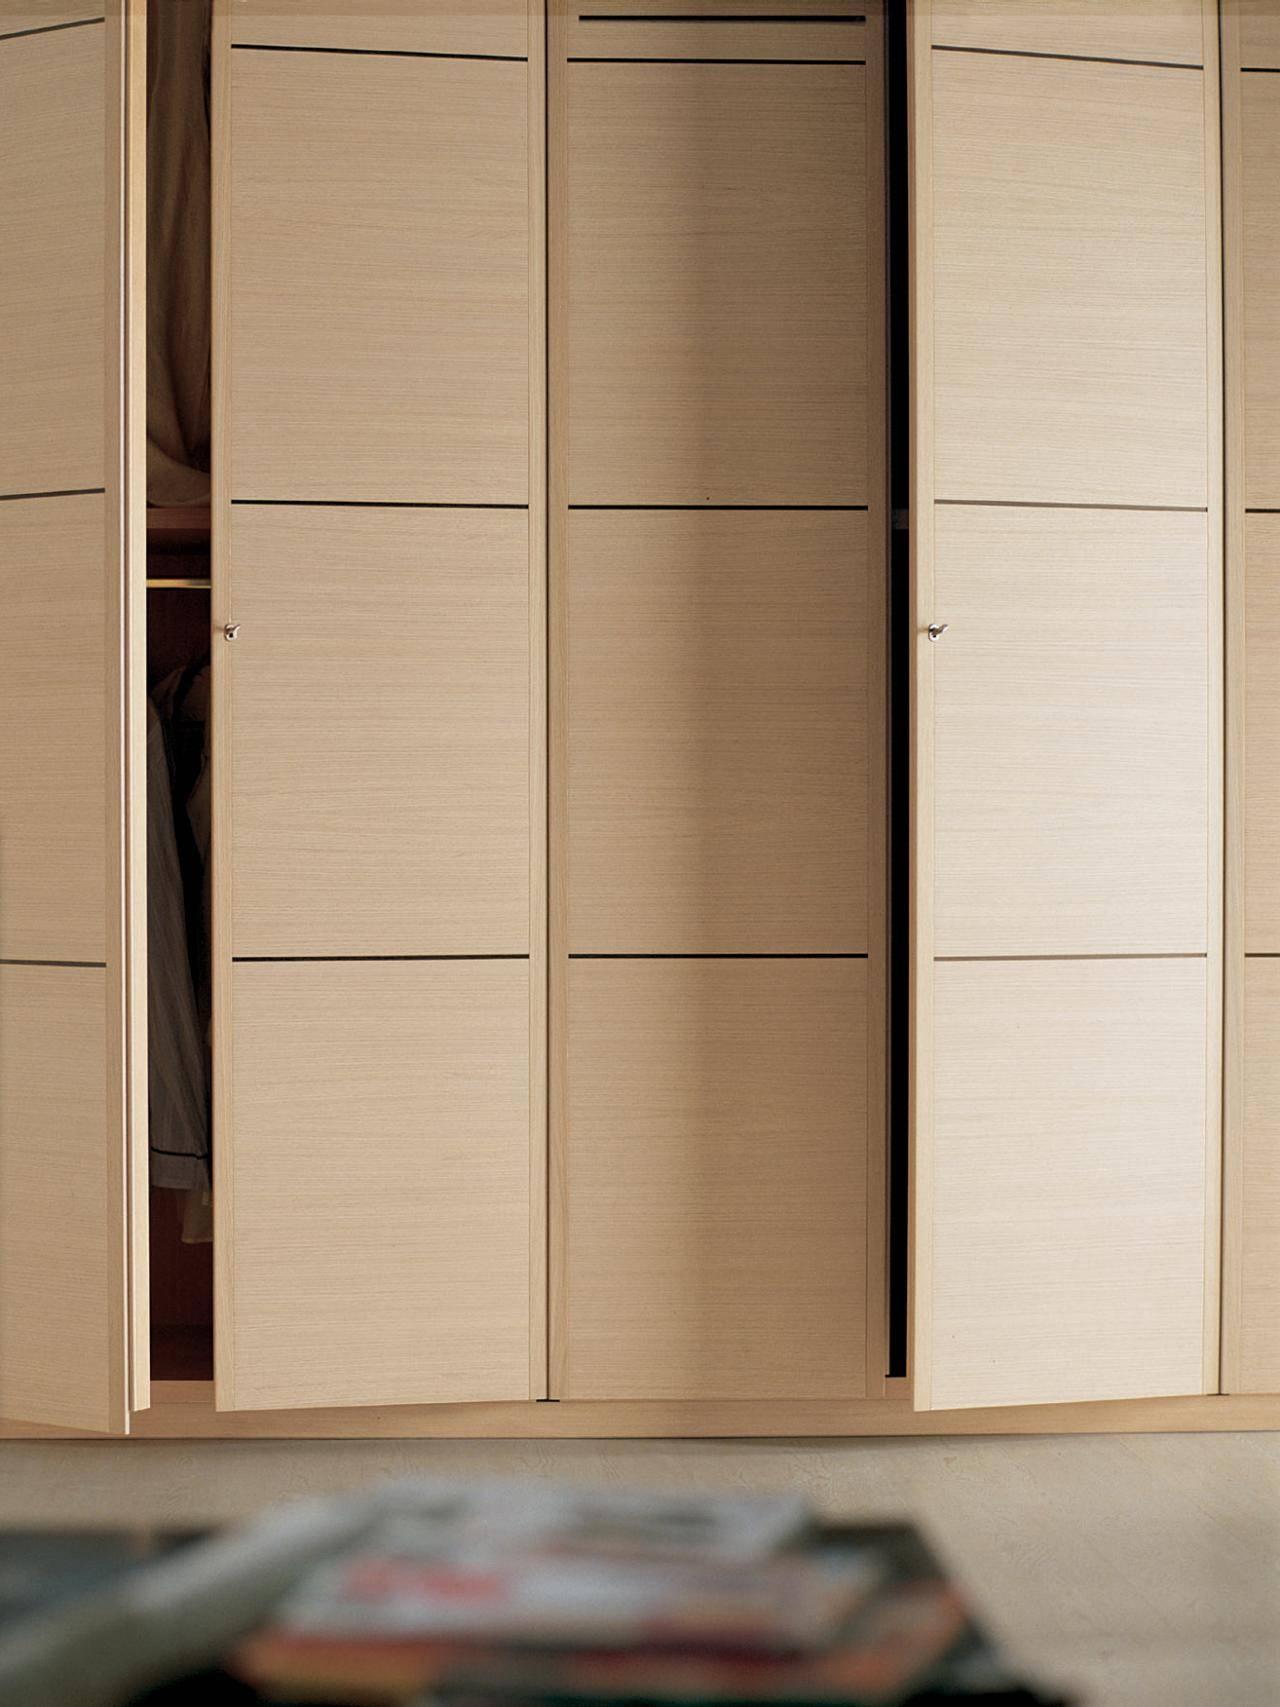 Sliding Closet Doors: Design Ideas And Options | Hgtv for Dark Wood Wardrobe Doors (Image 23 of 30)